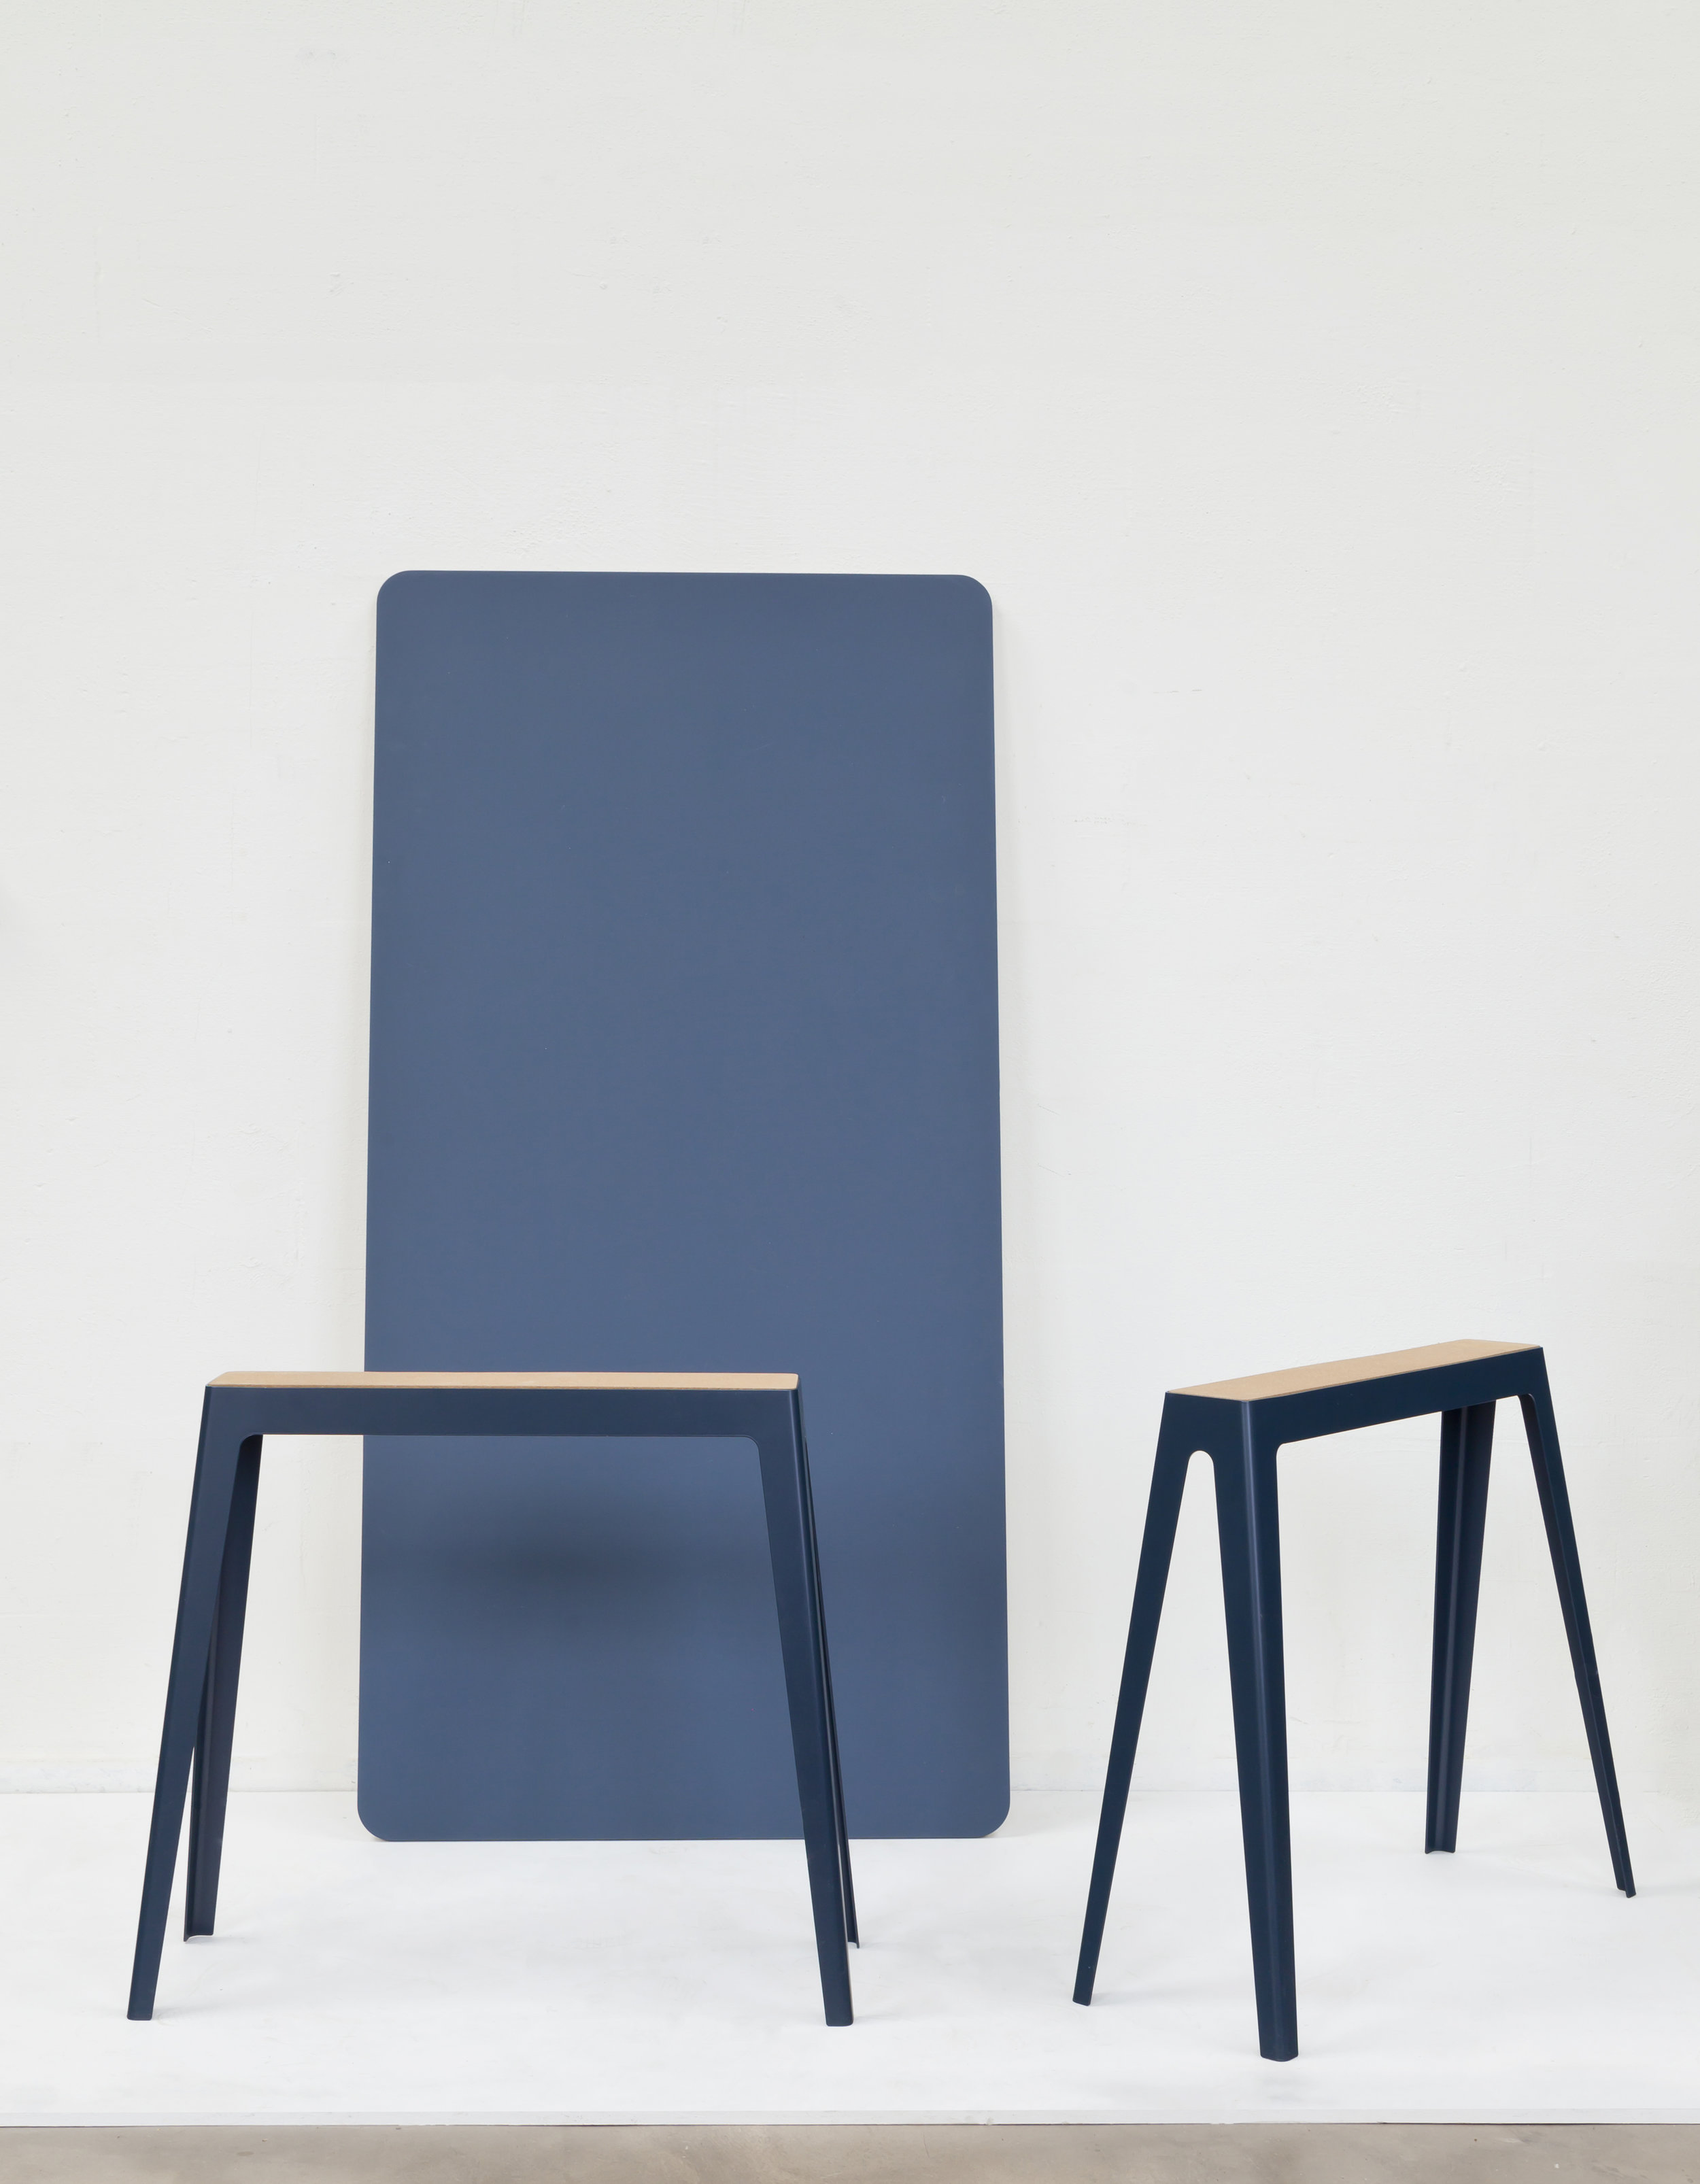 Vij5-Trestle-Table-by-David-Derksen-IMG_8412-2018-image-by-Vij5-.jpg